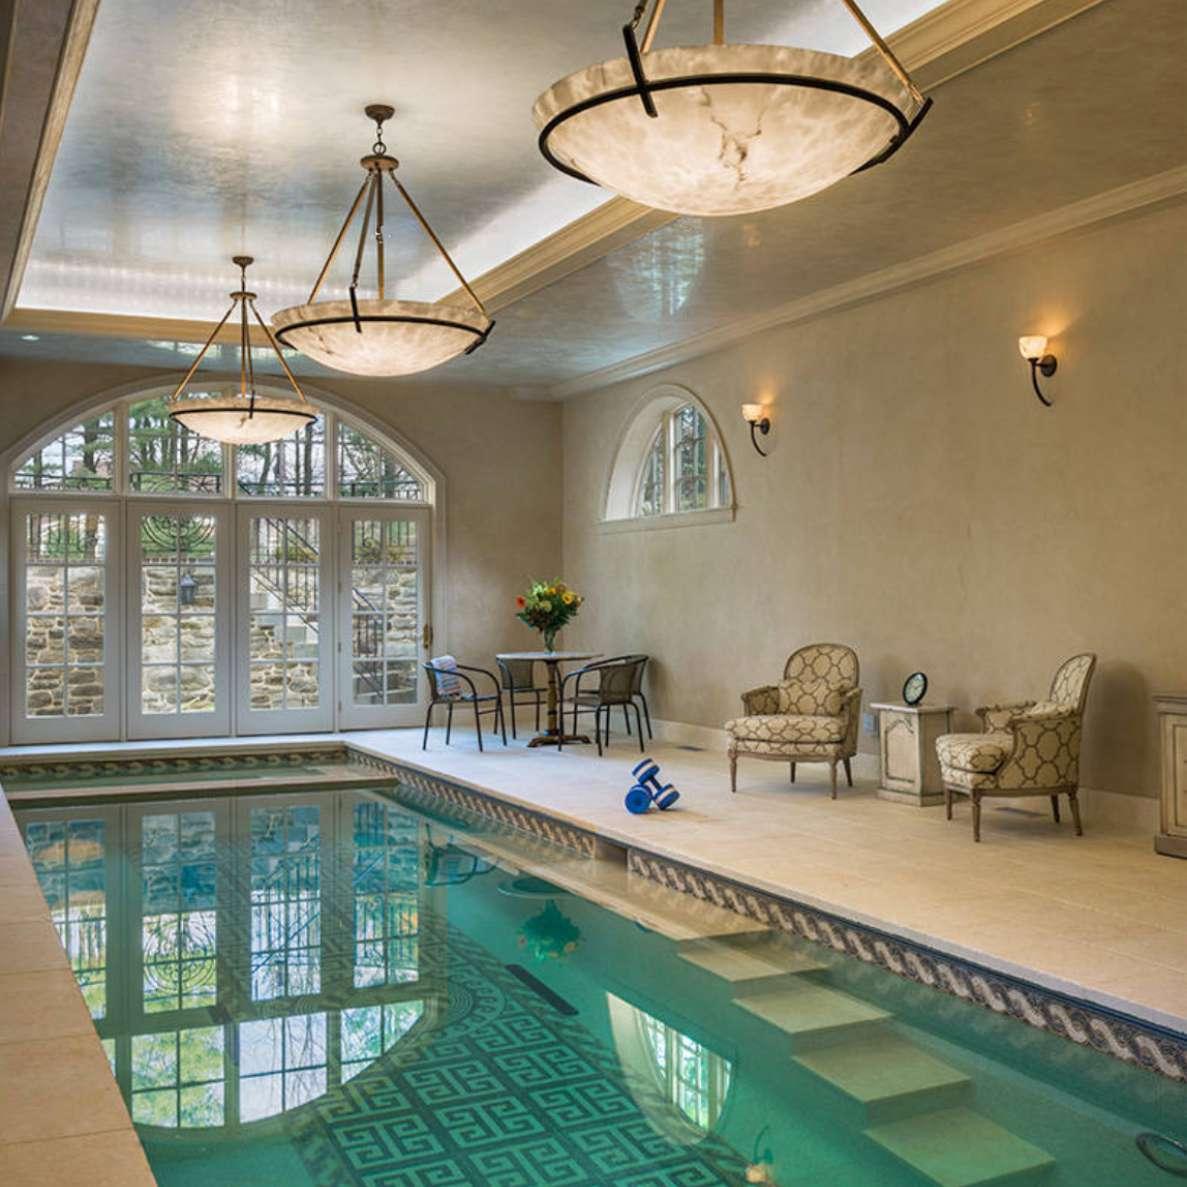 classic-style indoor pool